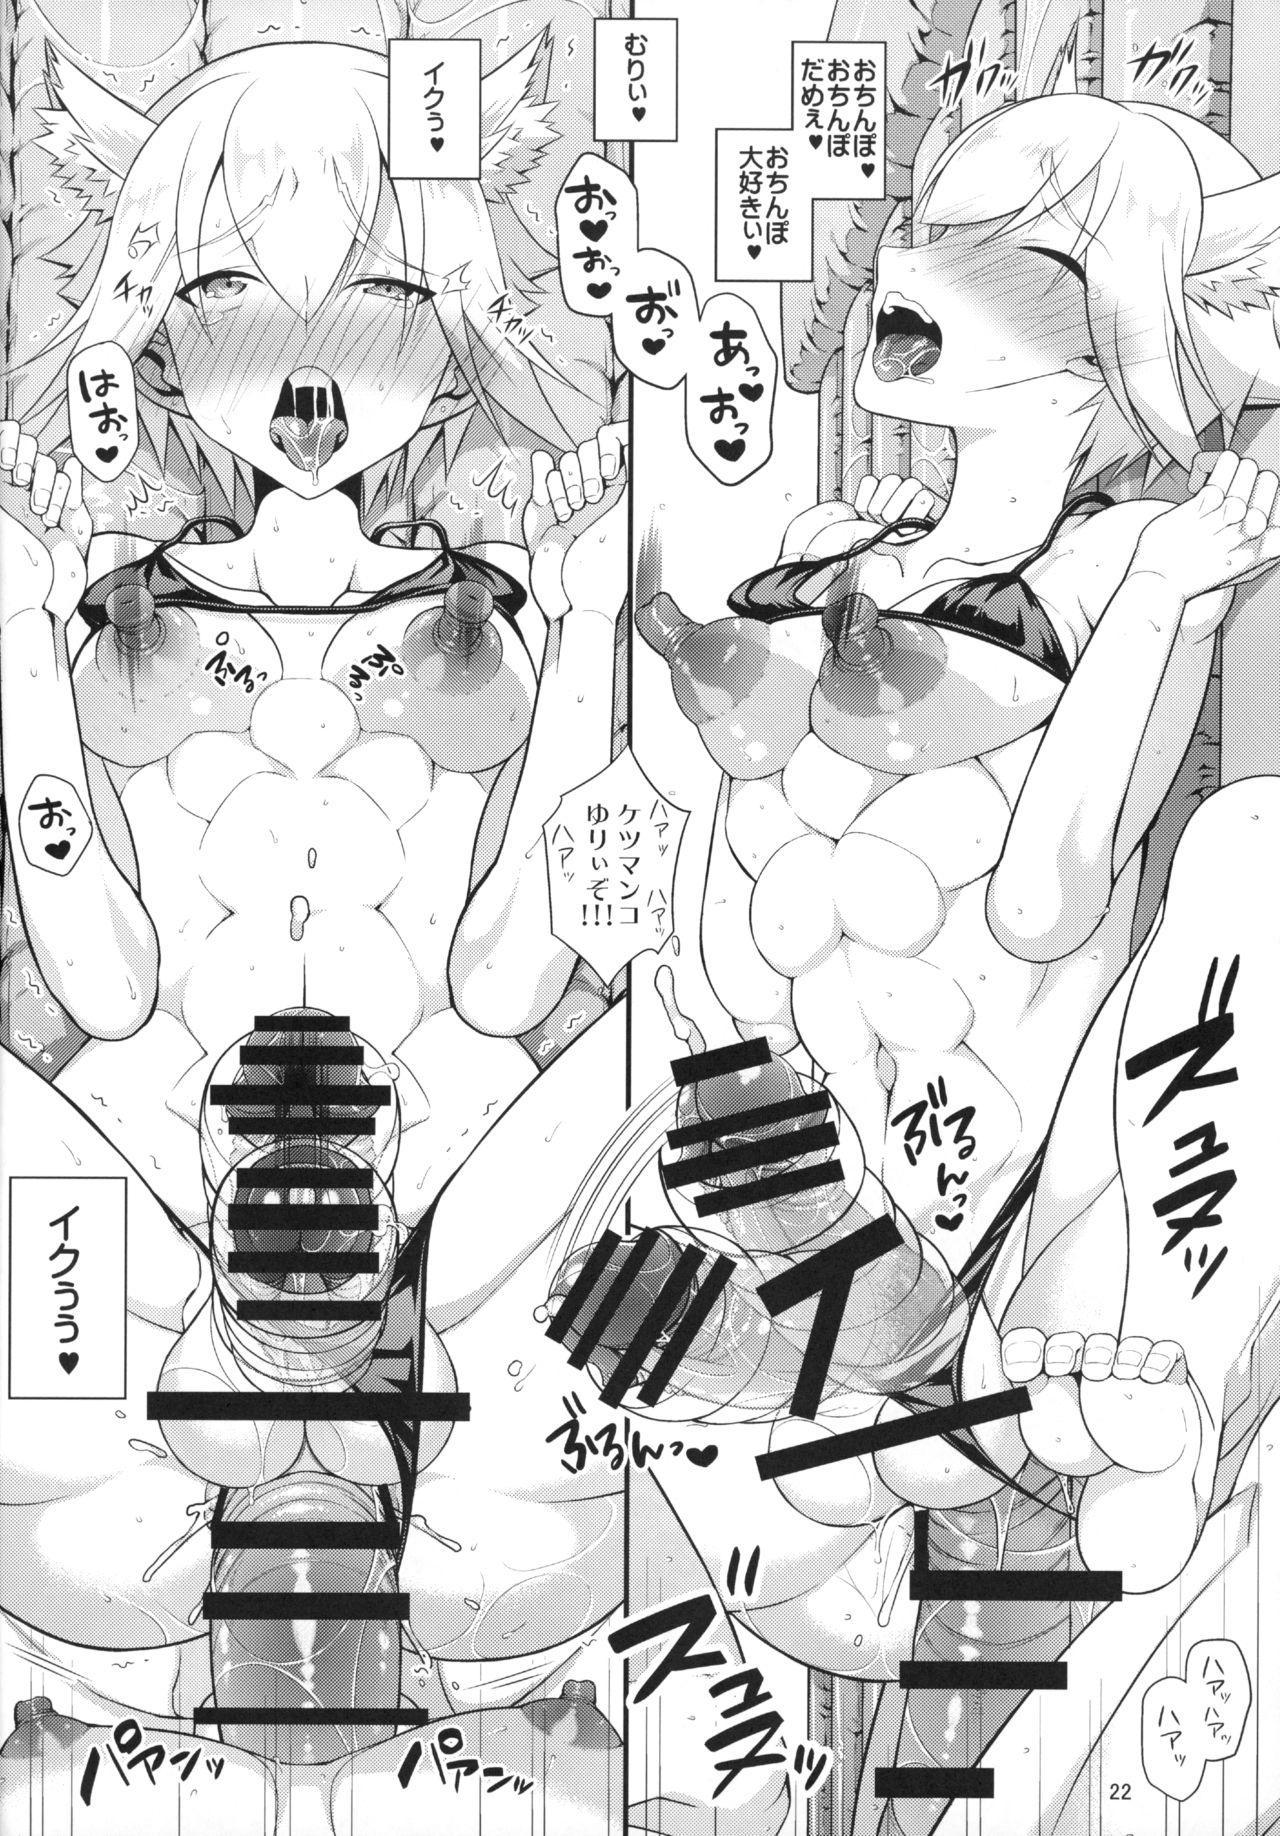 Otona no Mizuasobi 22